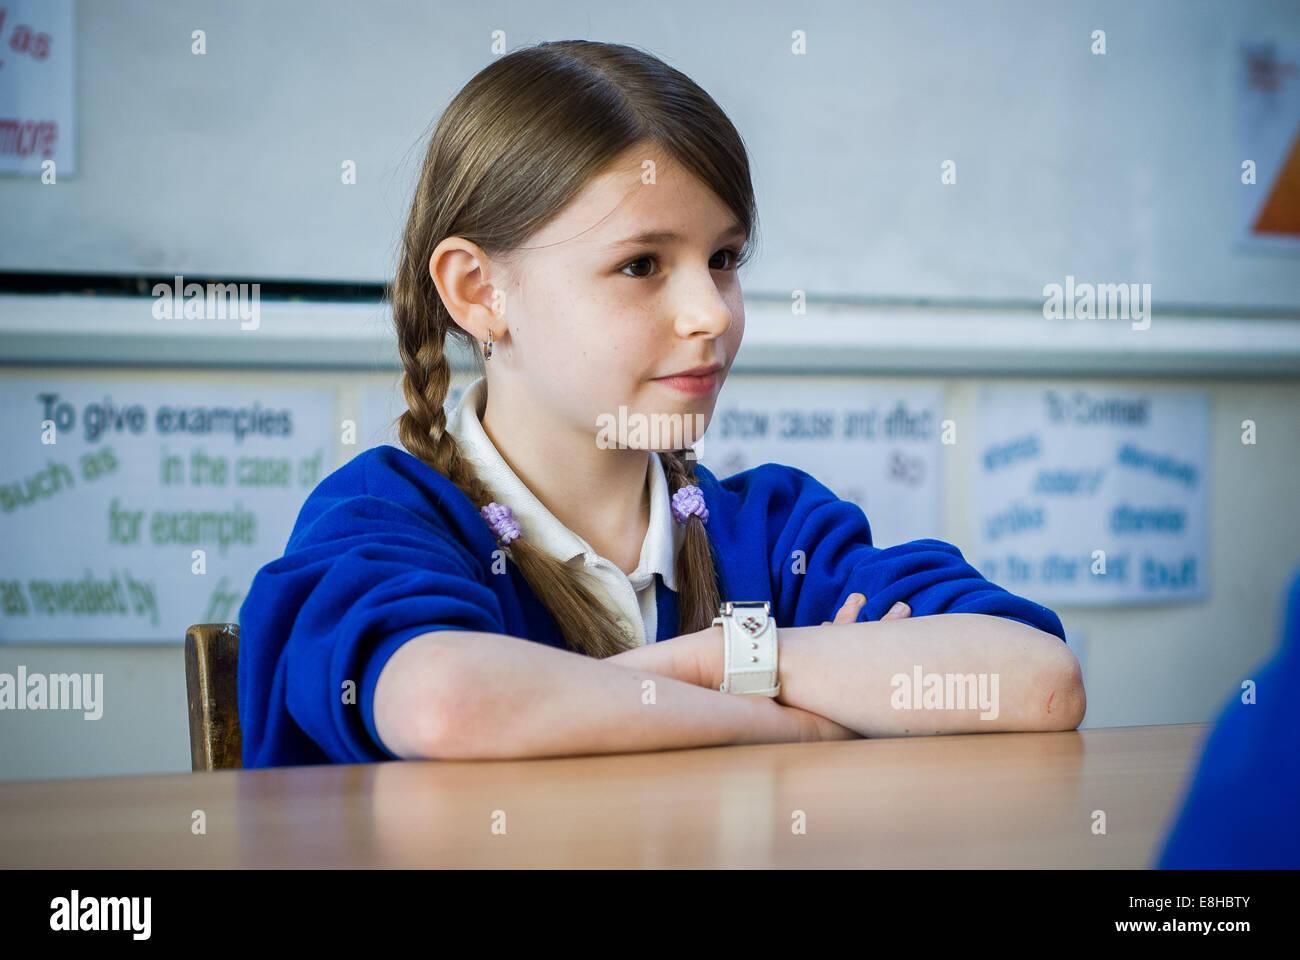 Primary school girl at desk in classroom,UK - Stock Image